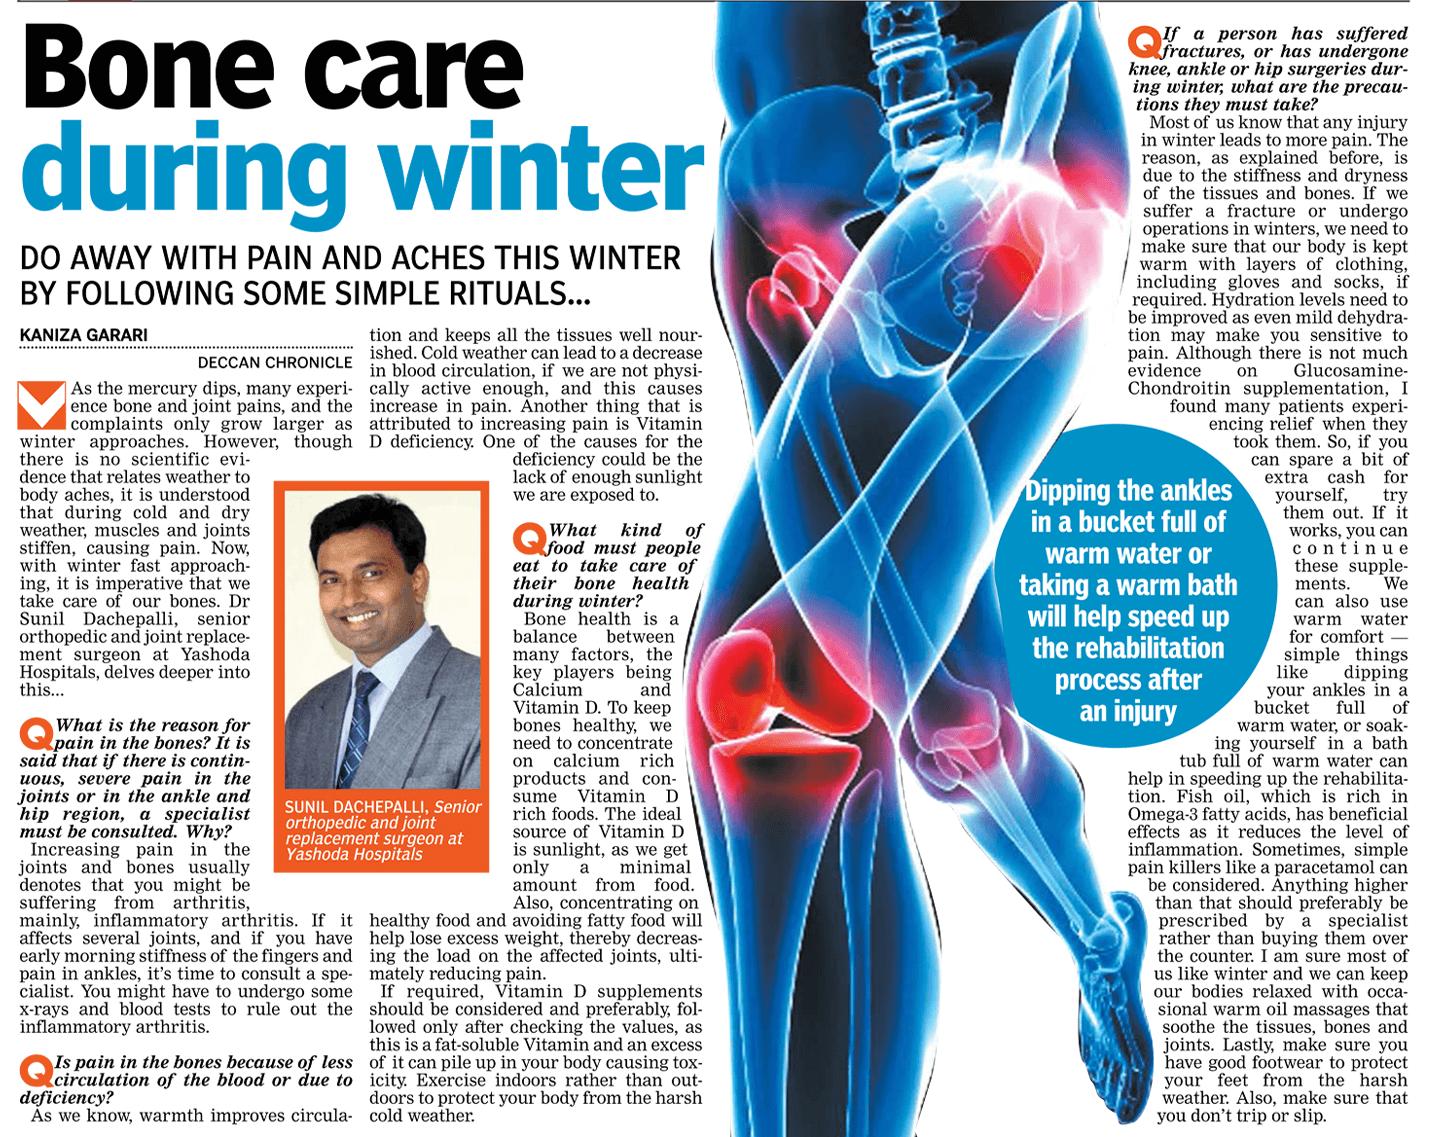 Bone care during winter